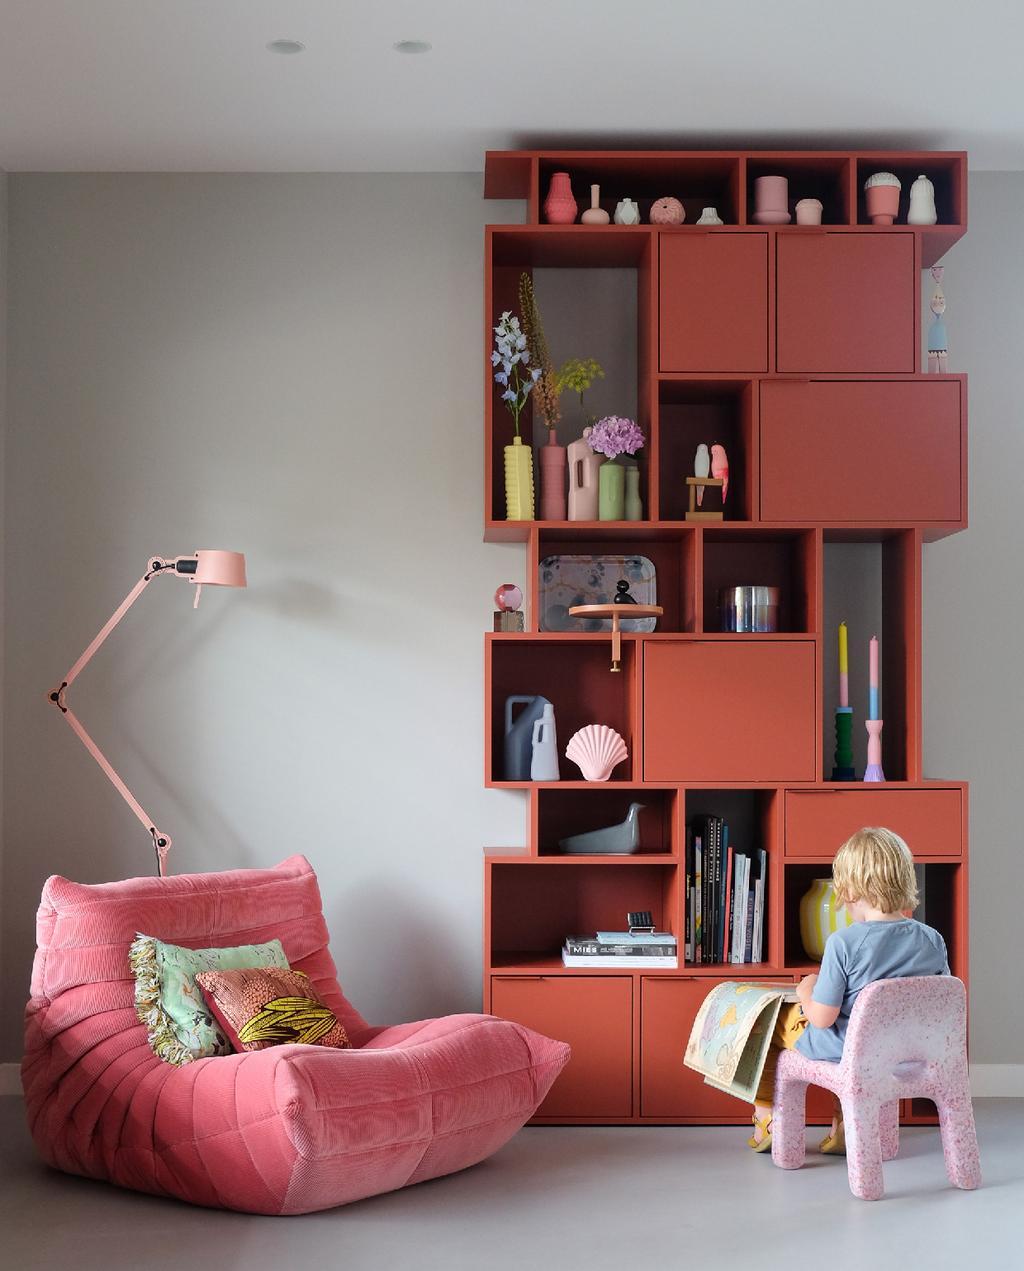 vtwonen blog prchtg | zoet design roze ligne roset , roze boekenkast en aardbeienstoel